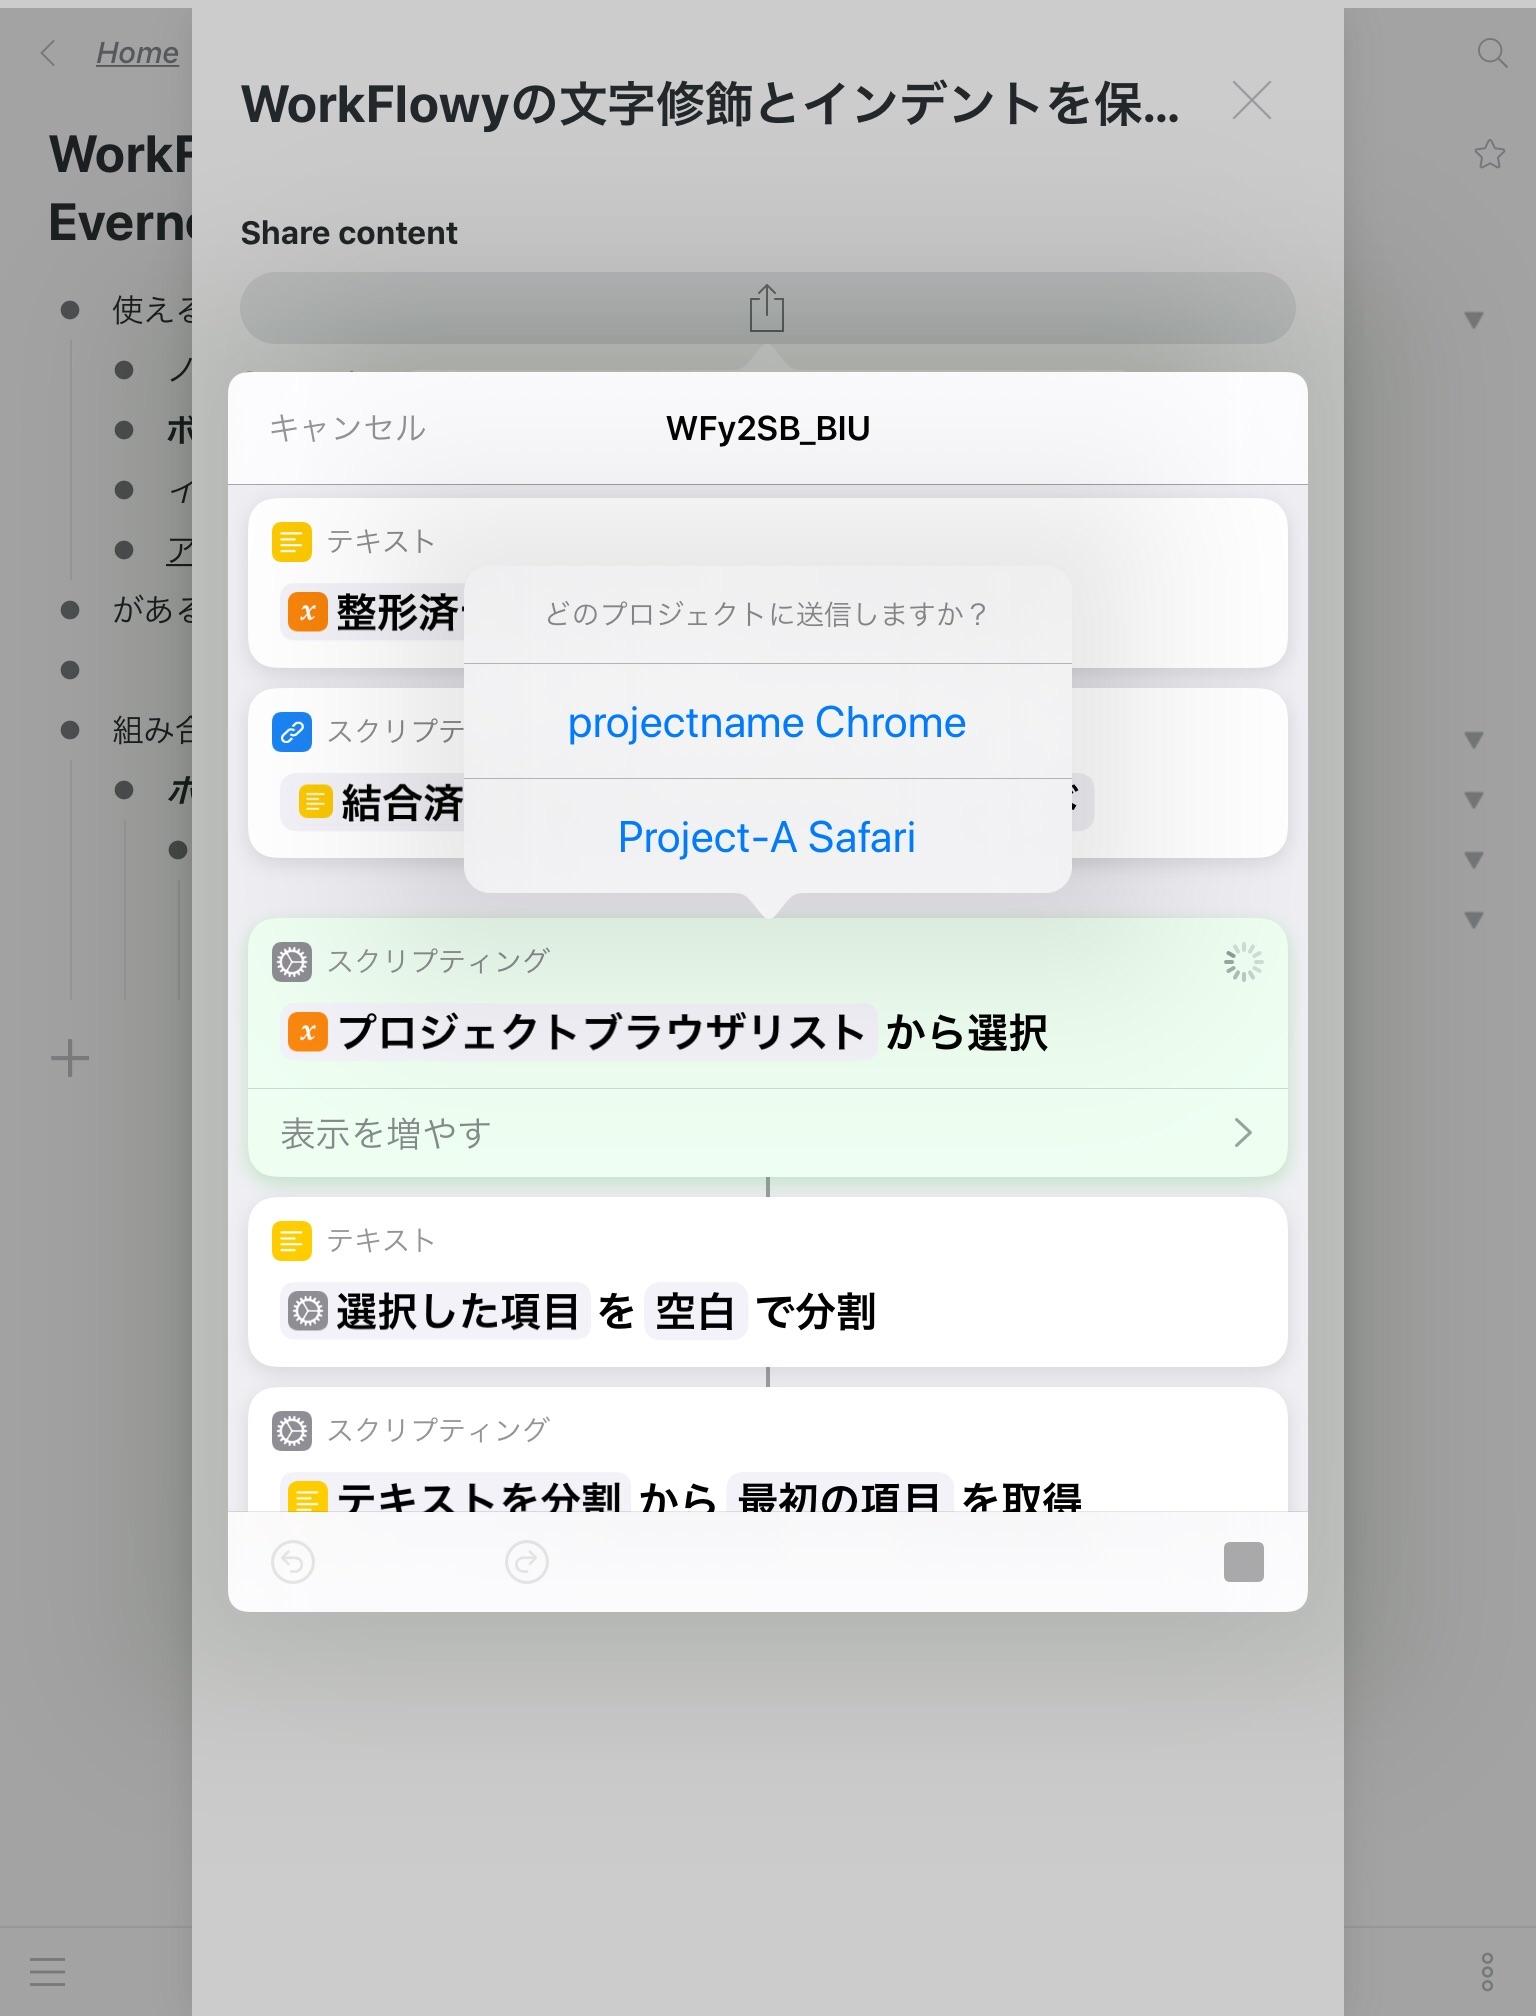 f:id:sorashima:20200731233515j:plain:w637